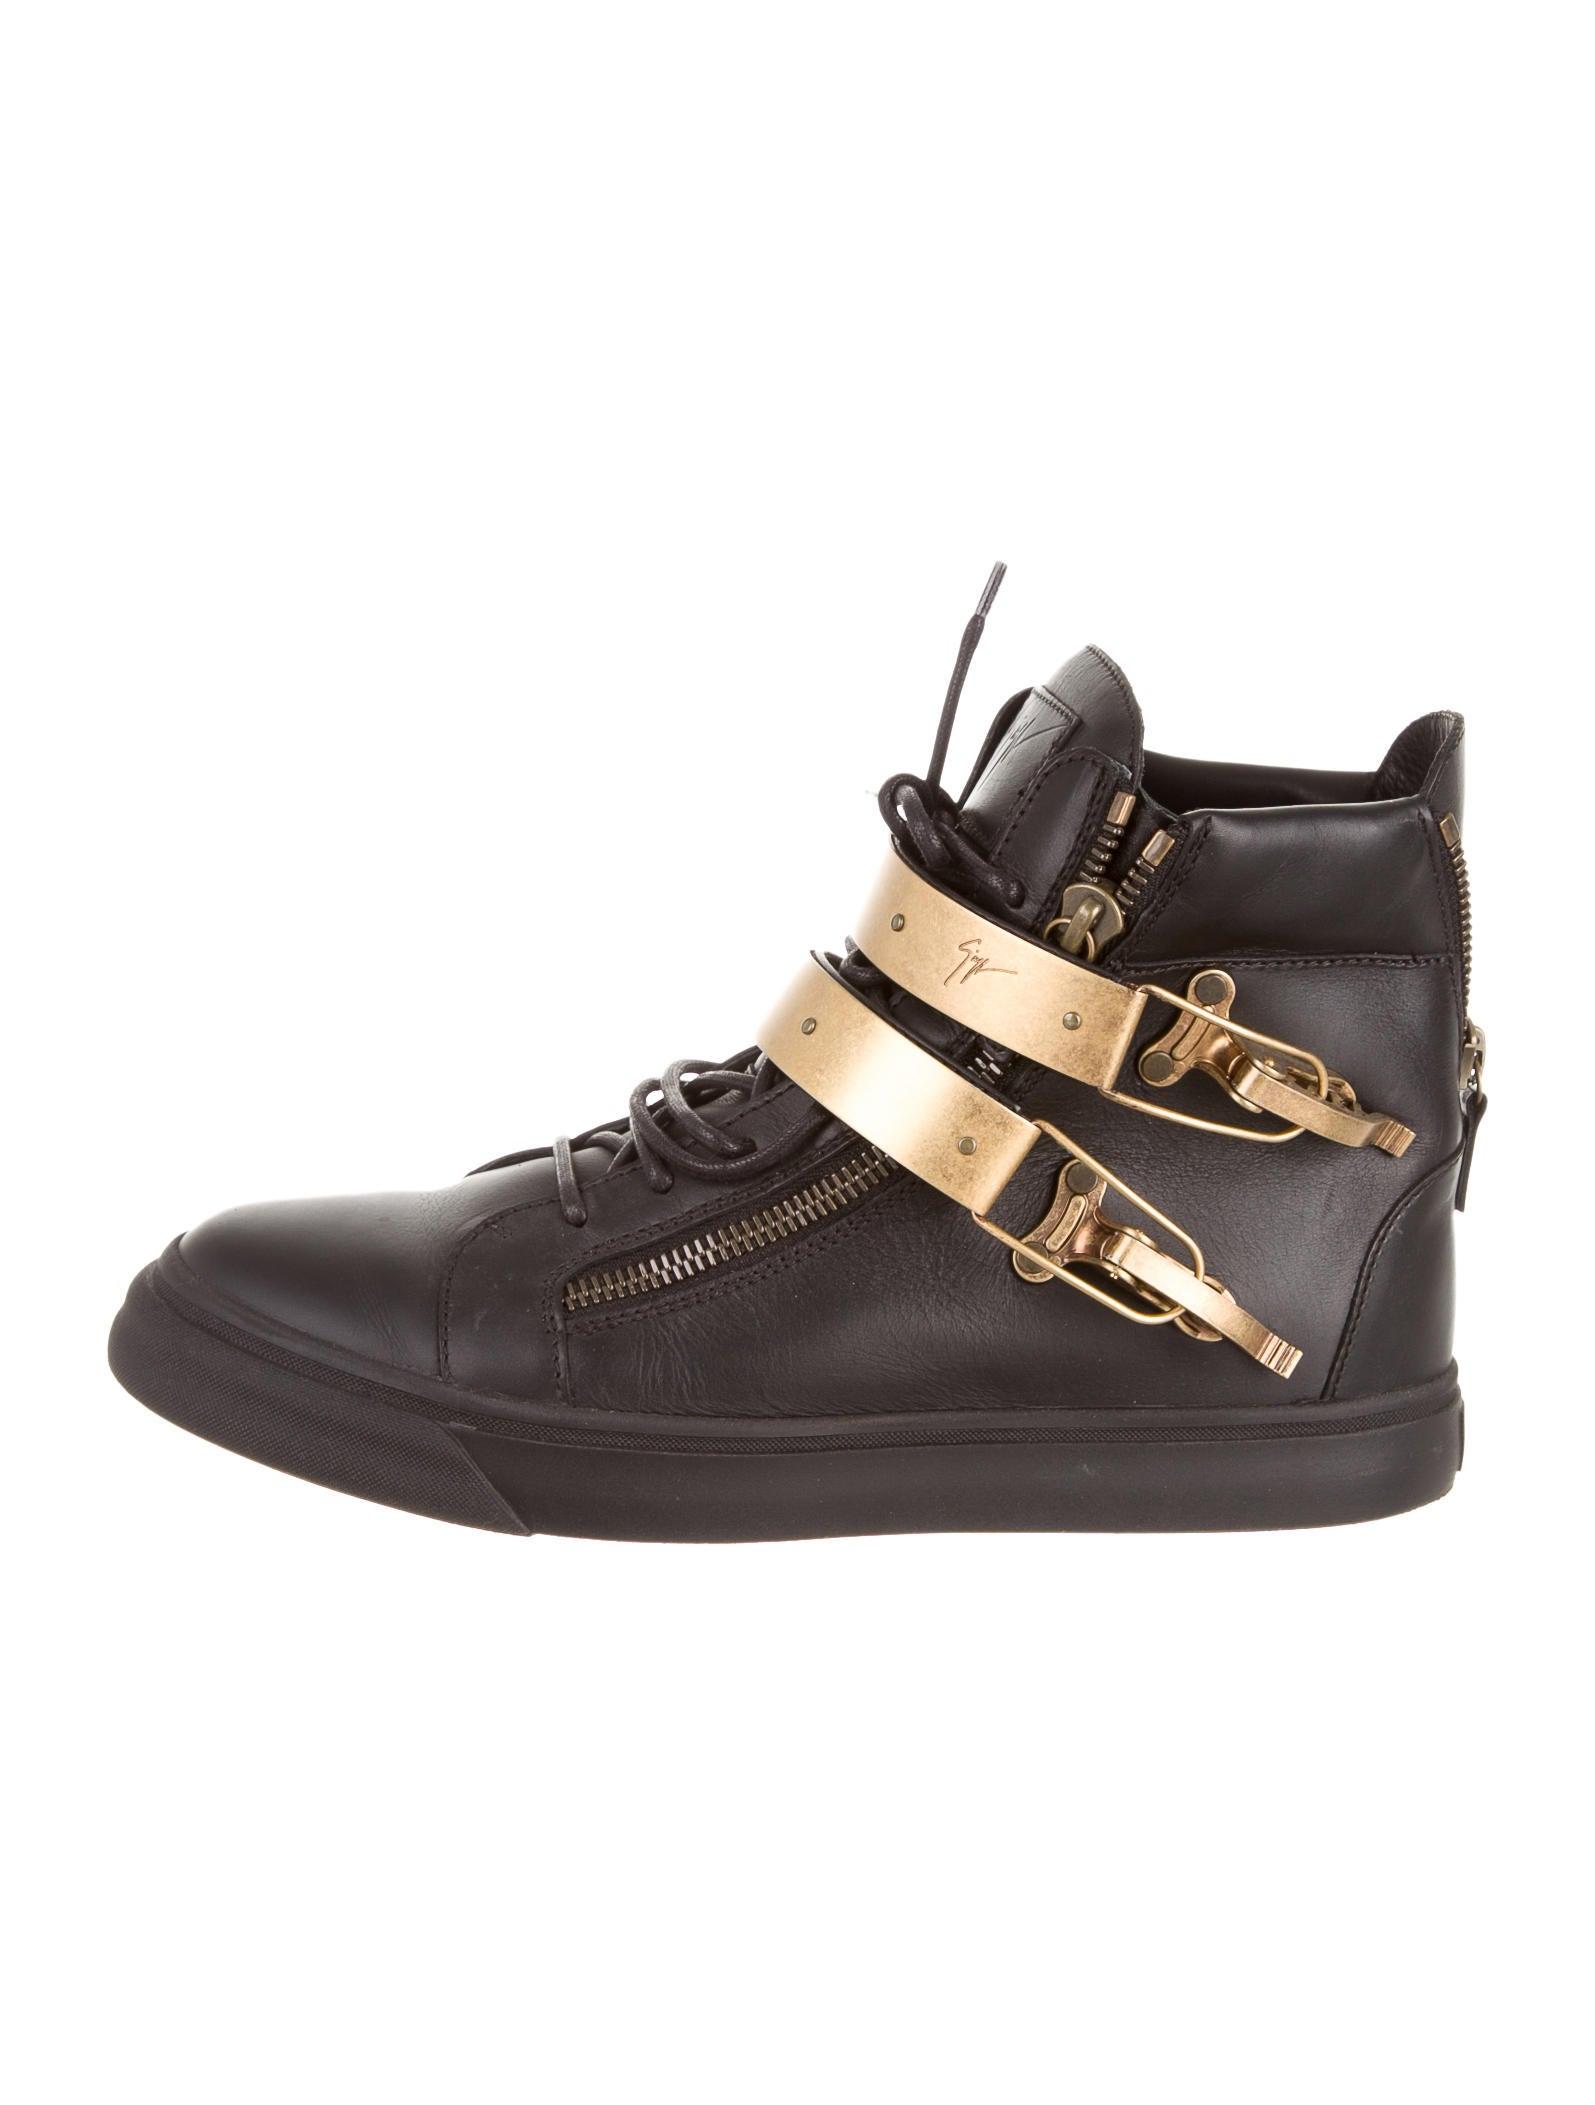 giuseppe zanotti sneakers mens shoes giu24586 the